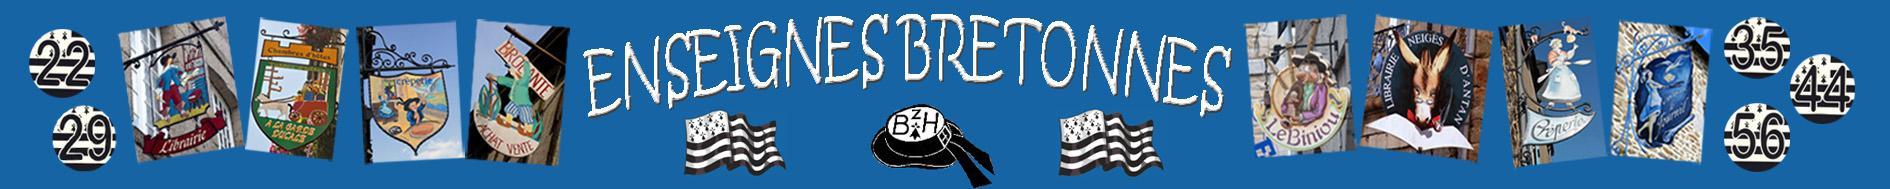 Enseignes bretonnes